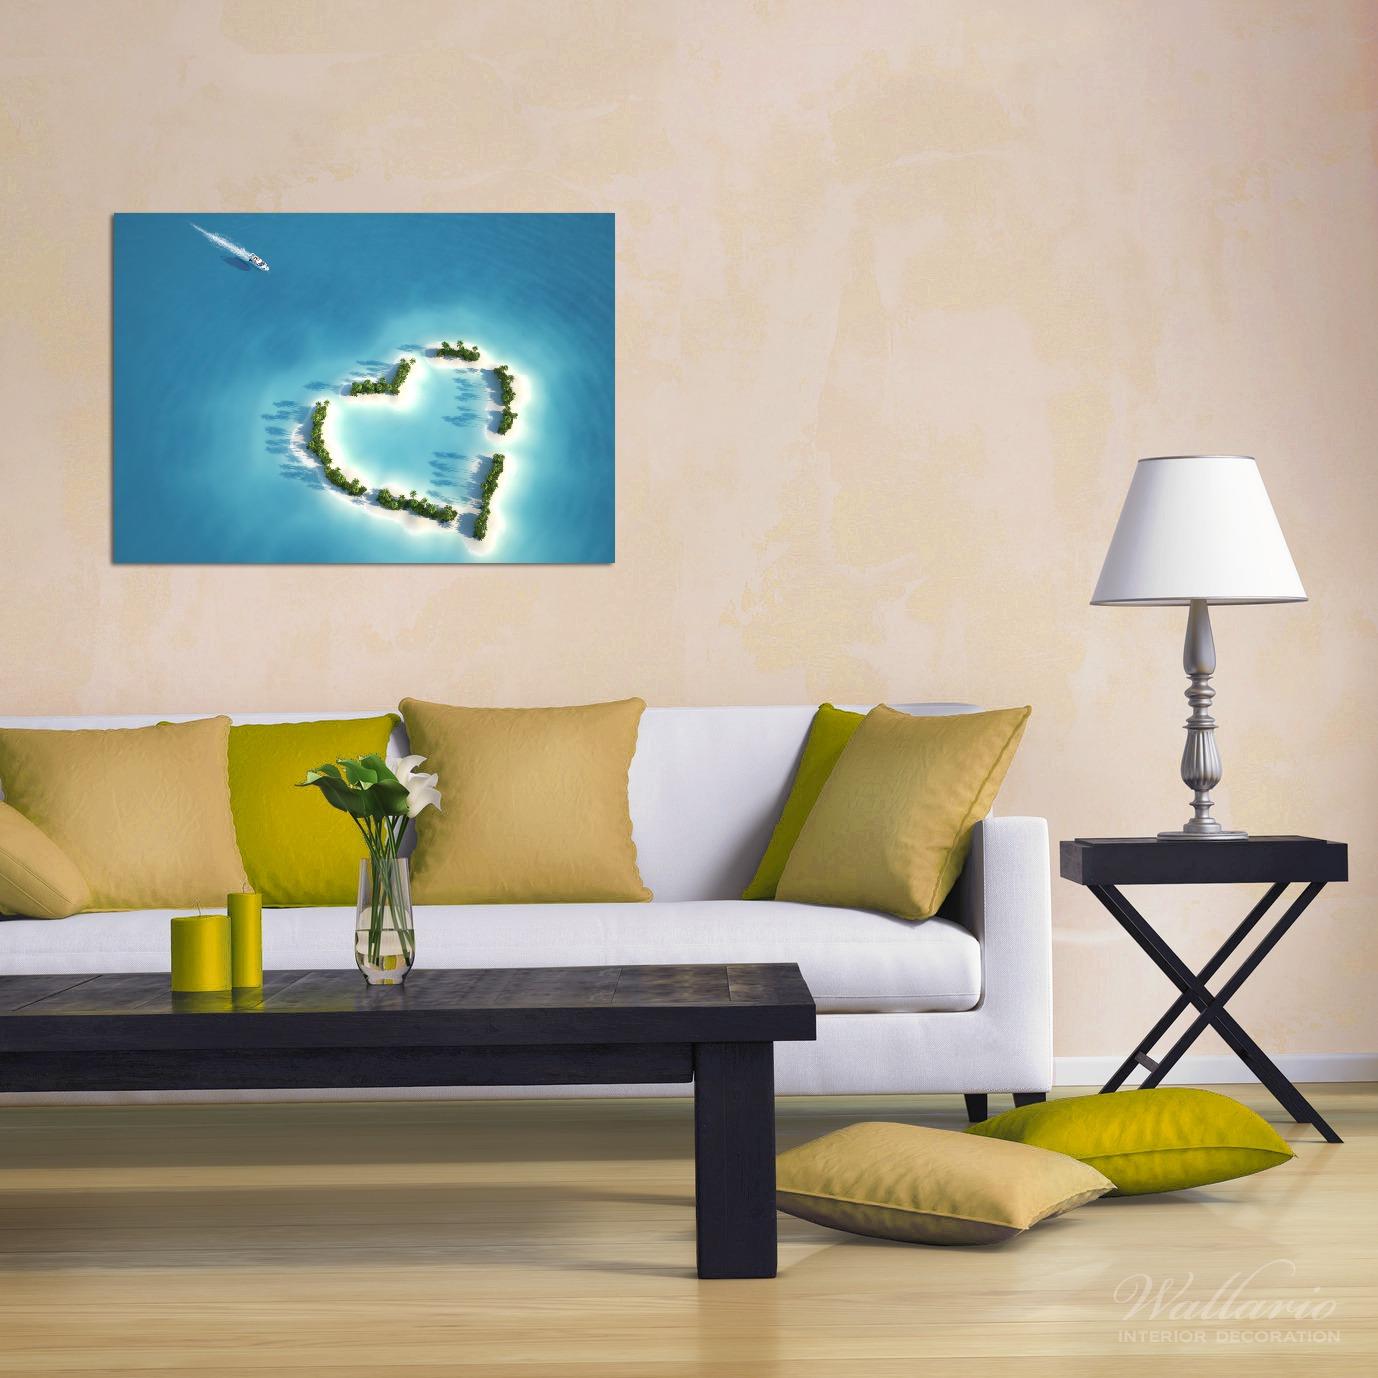 Wandbild Insel mit Herz – Bild 2